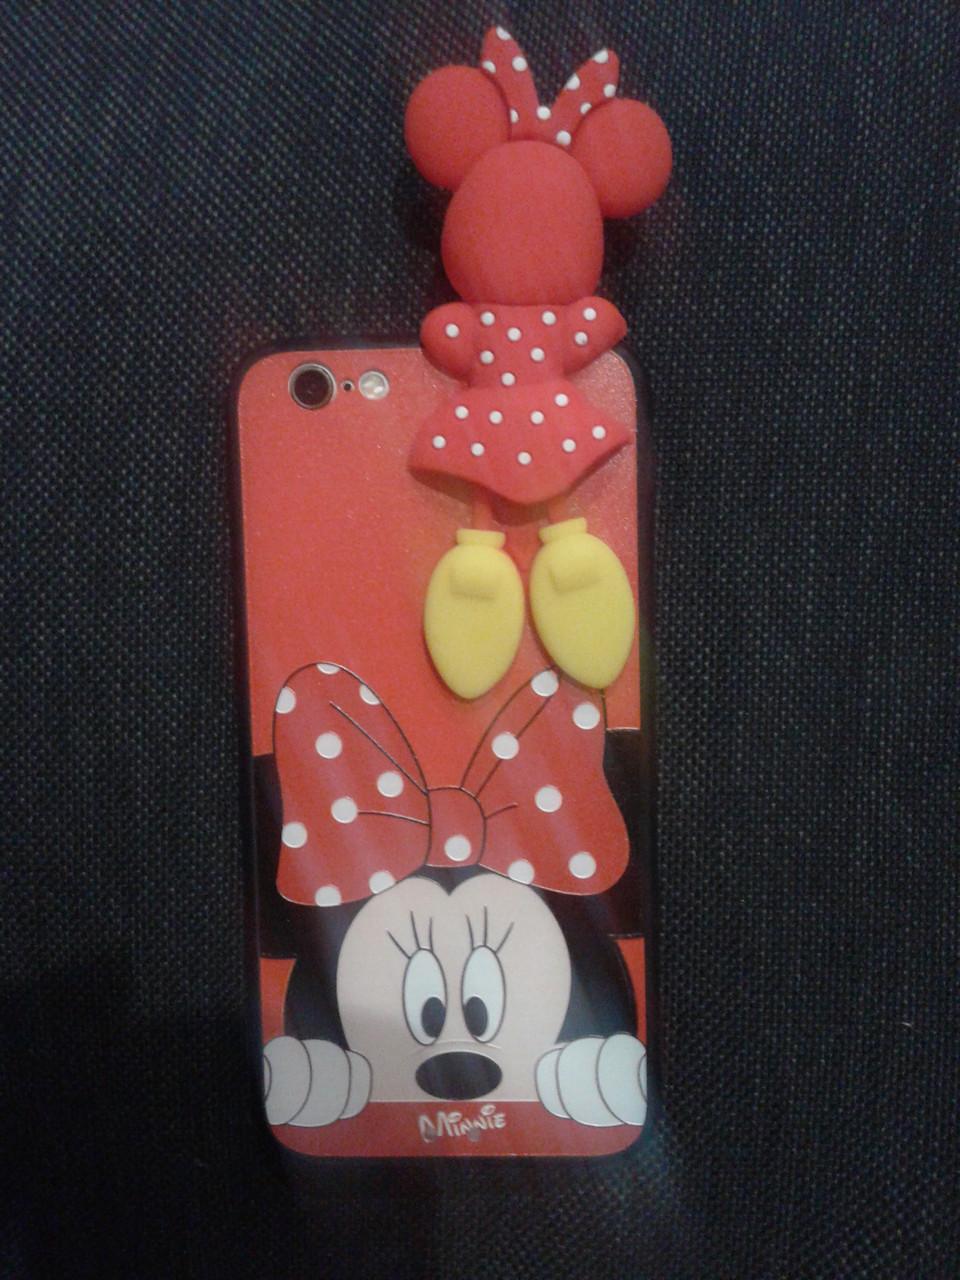 Силикон Disney Minnie Mouse for iPhone 6 /6S